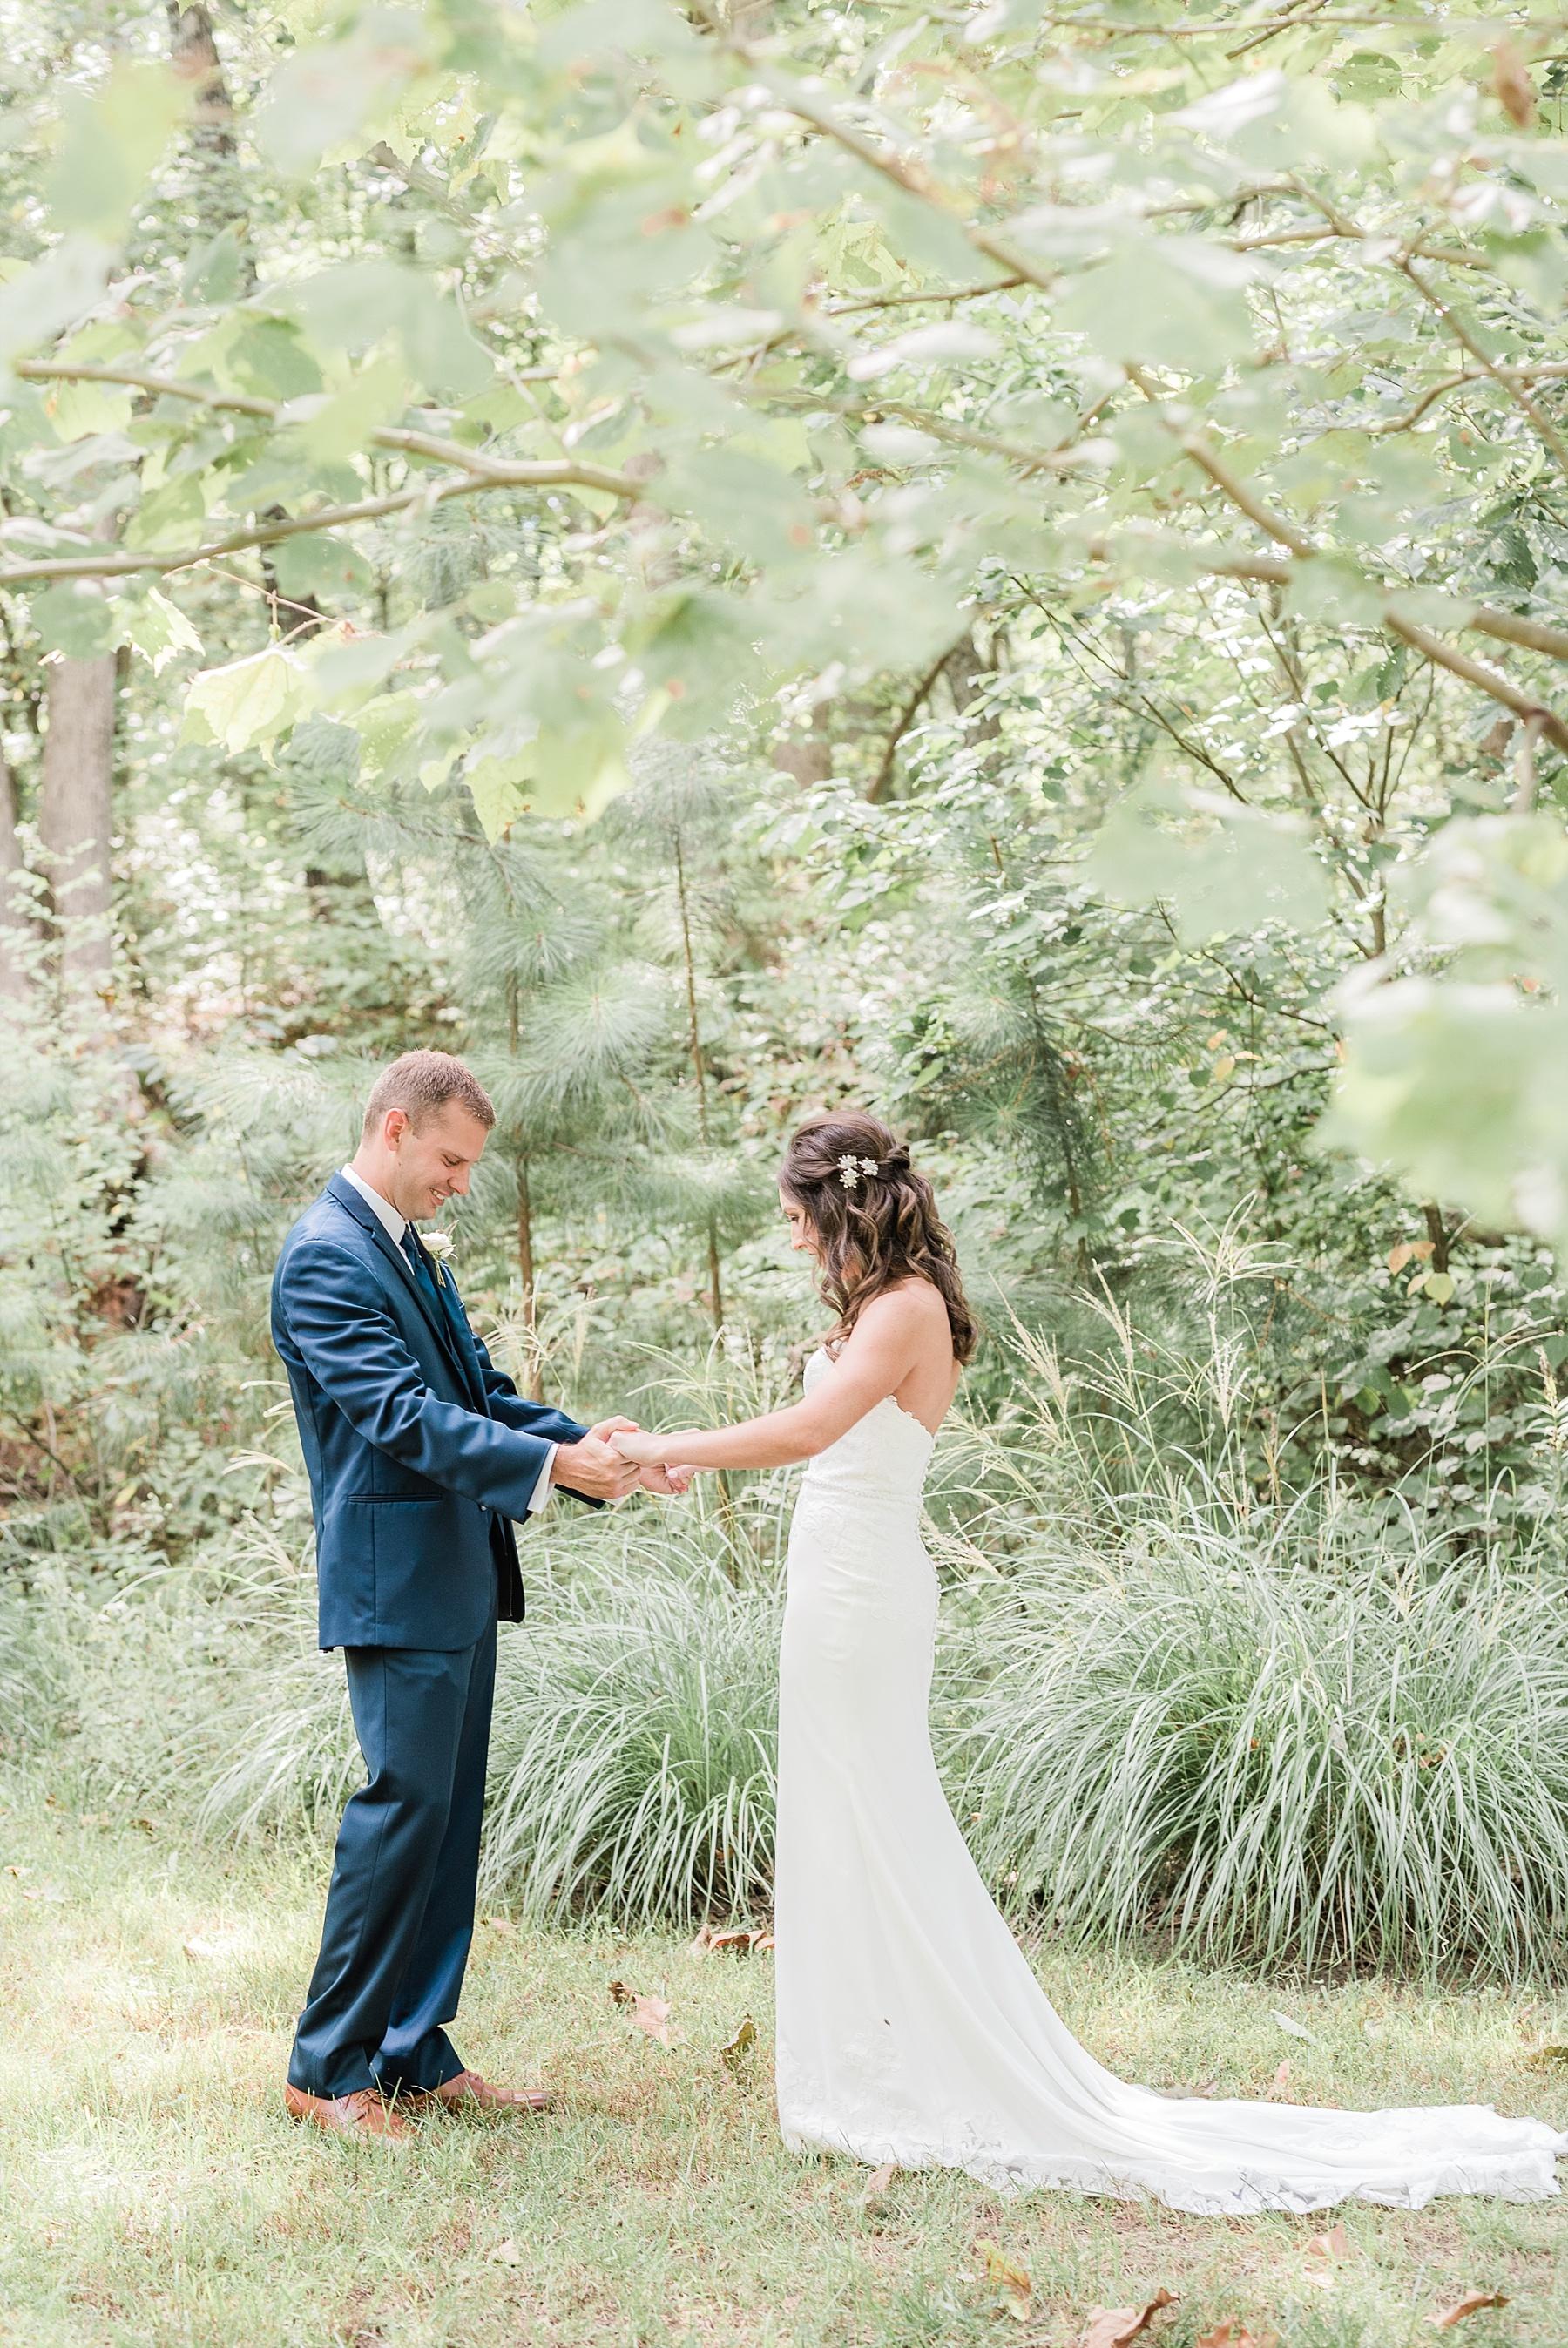 Romantic Summer Sunset Wedding Ceremony at Little Piney Lodge St. Louis Missouri by Kelsi Kliethermes Photography Fine Art Photographer_0044.jpg